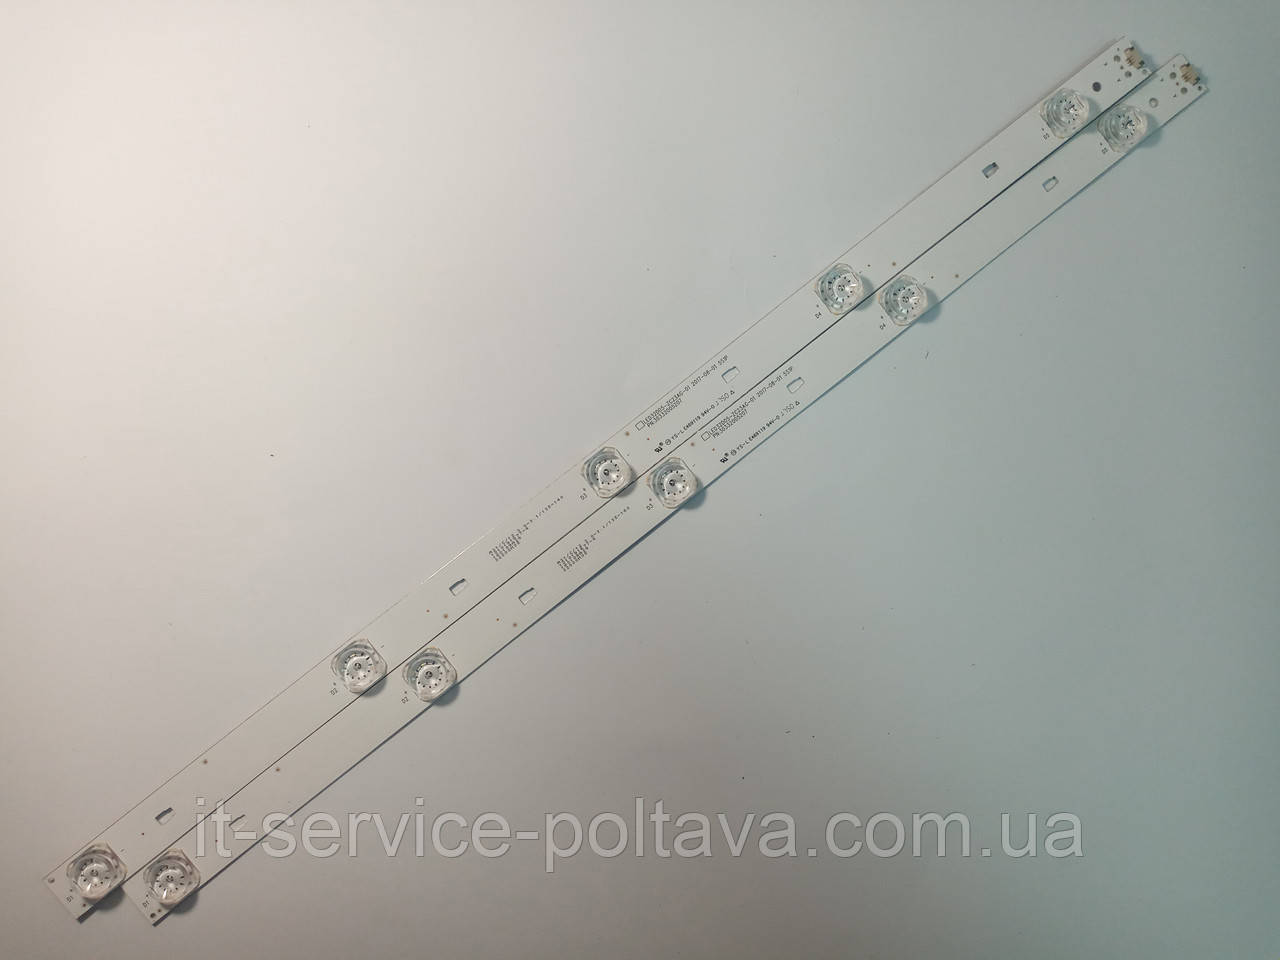 LED підсвітка LED32D05-ZC23AG-01